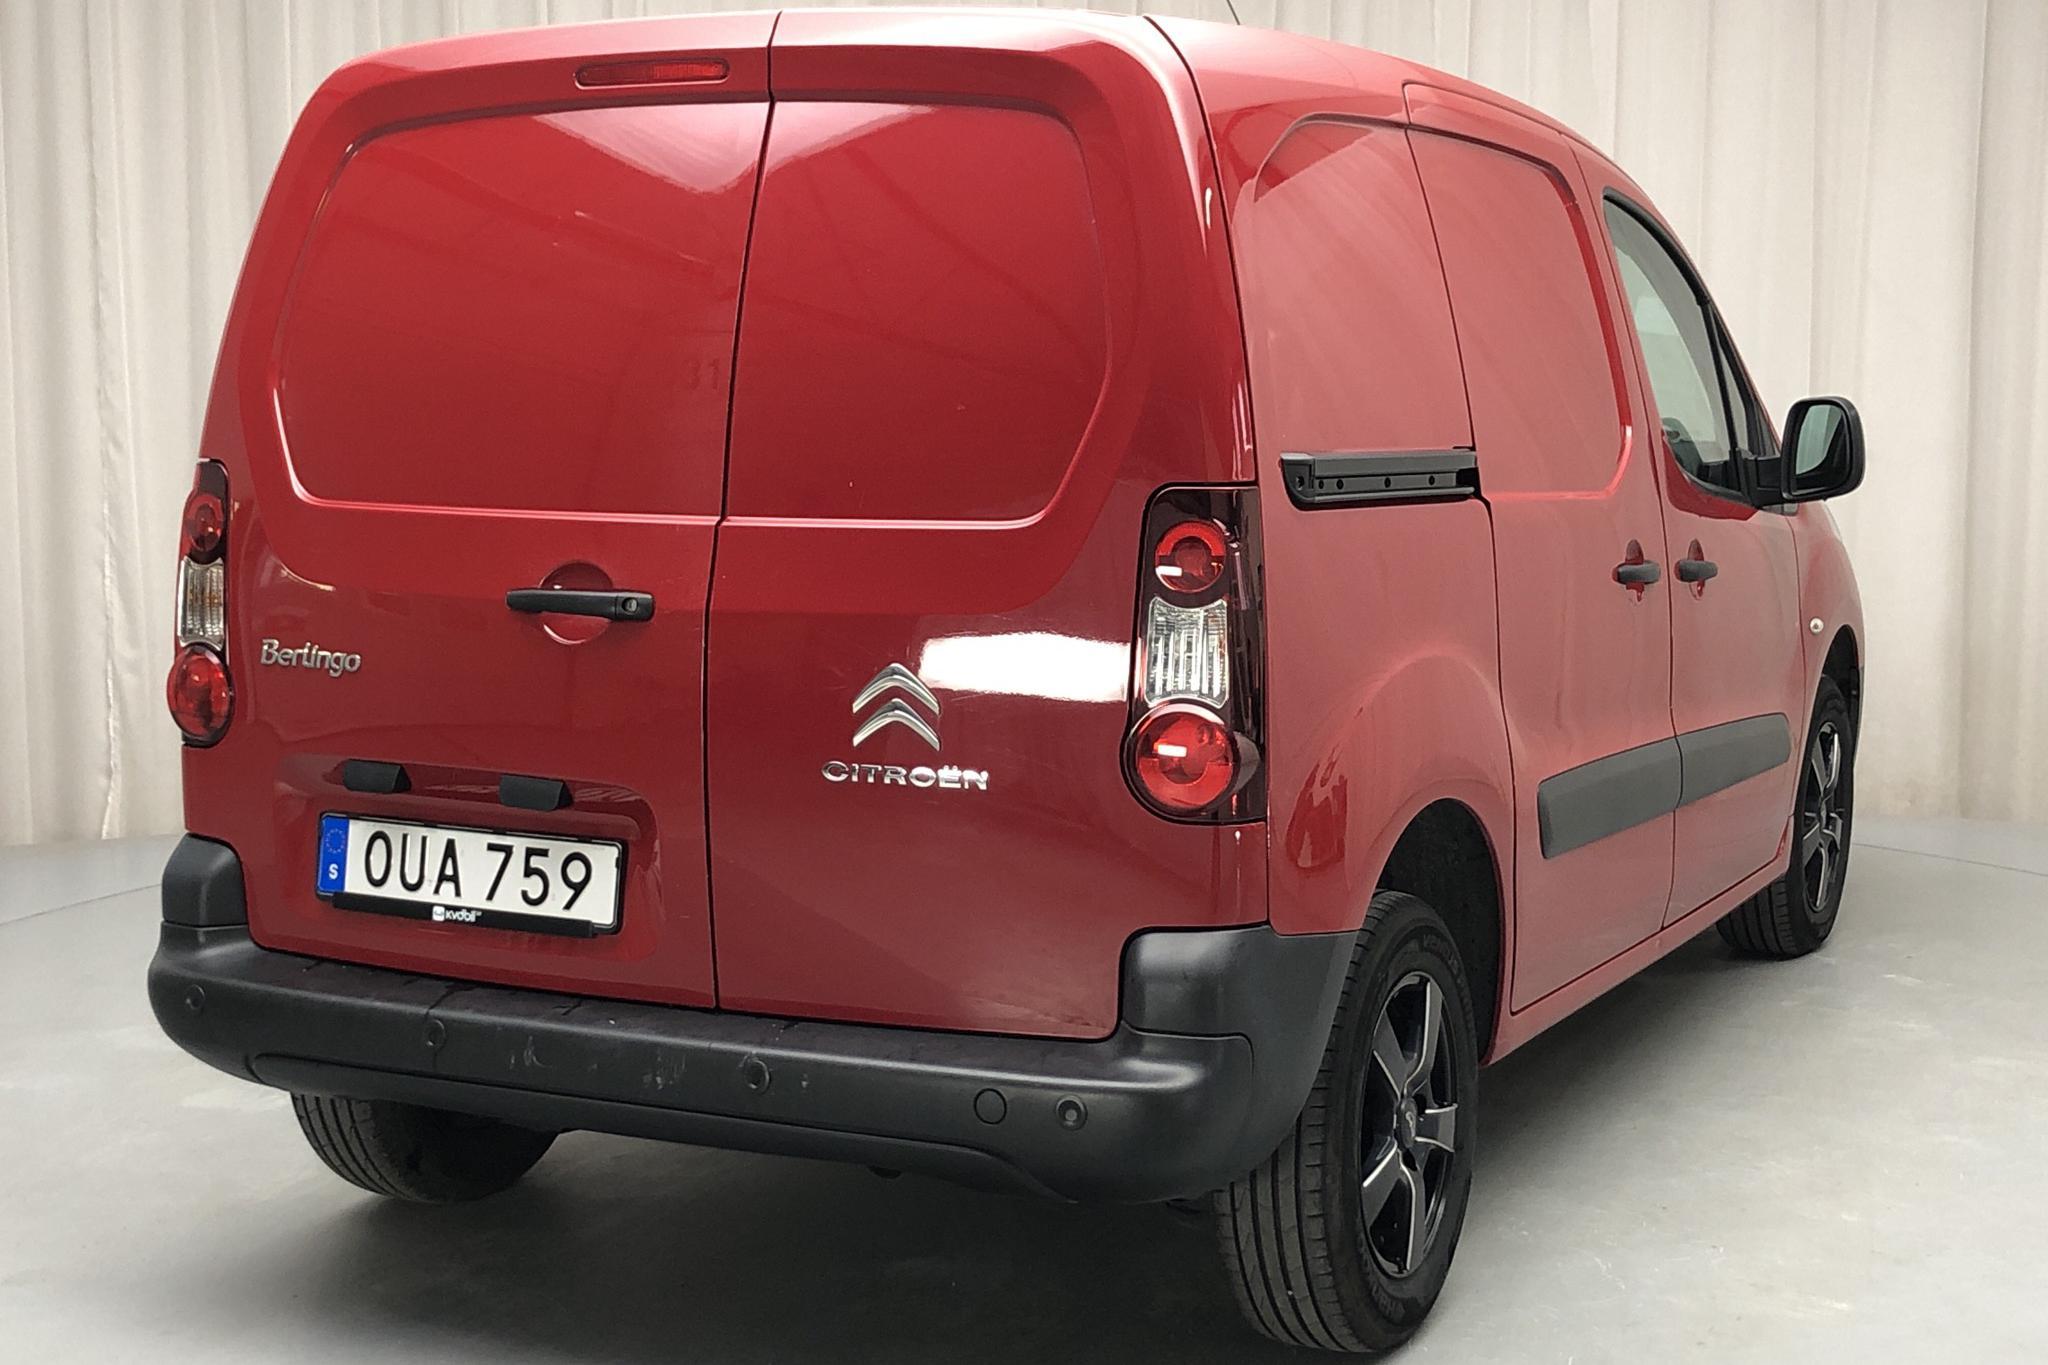 Citroen Berlingo III 1.6 HDi Skåp (75hk) - 10 991 mil - Manuell - röd - 2015